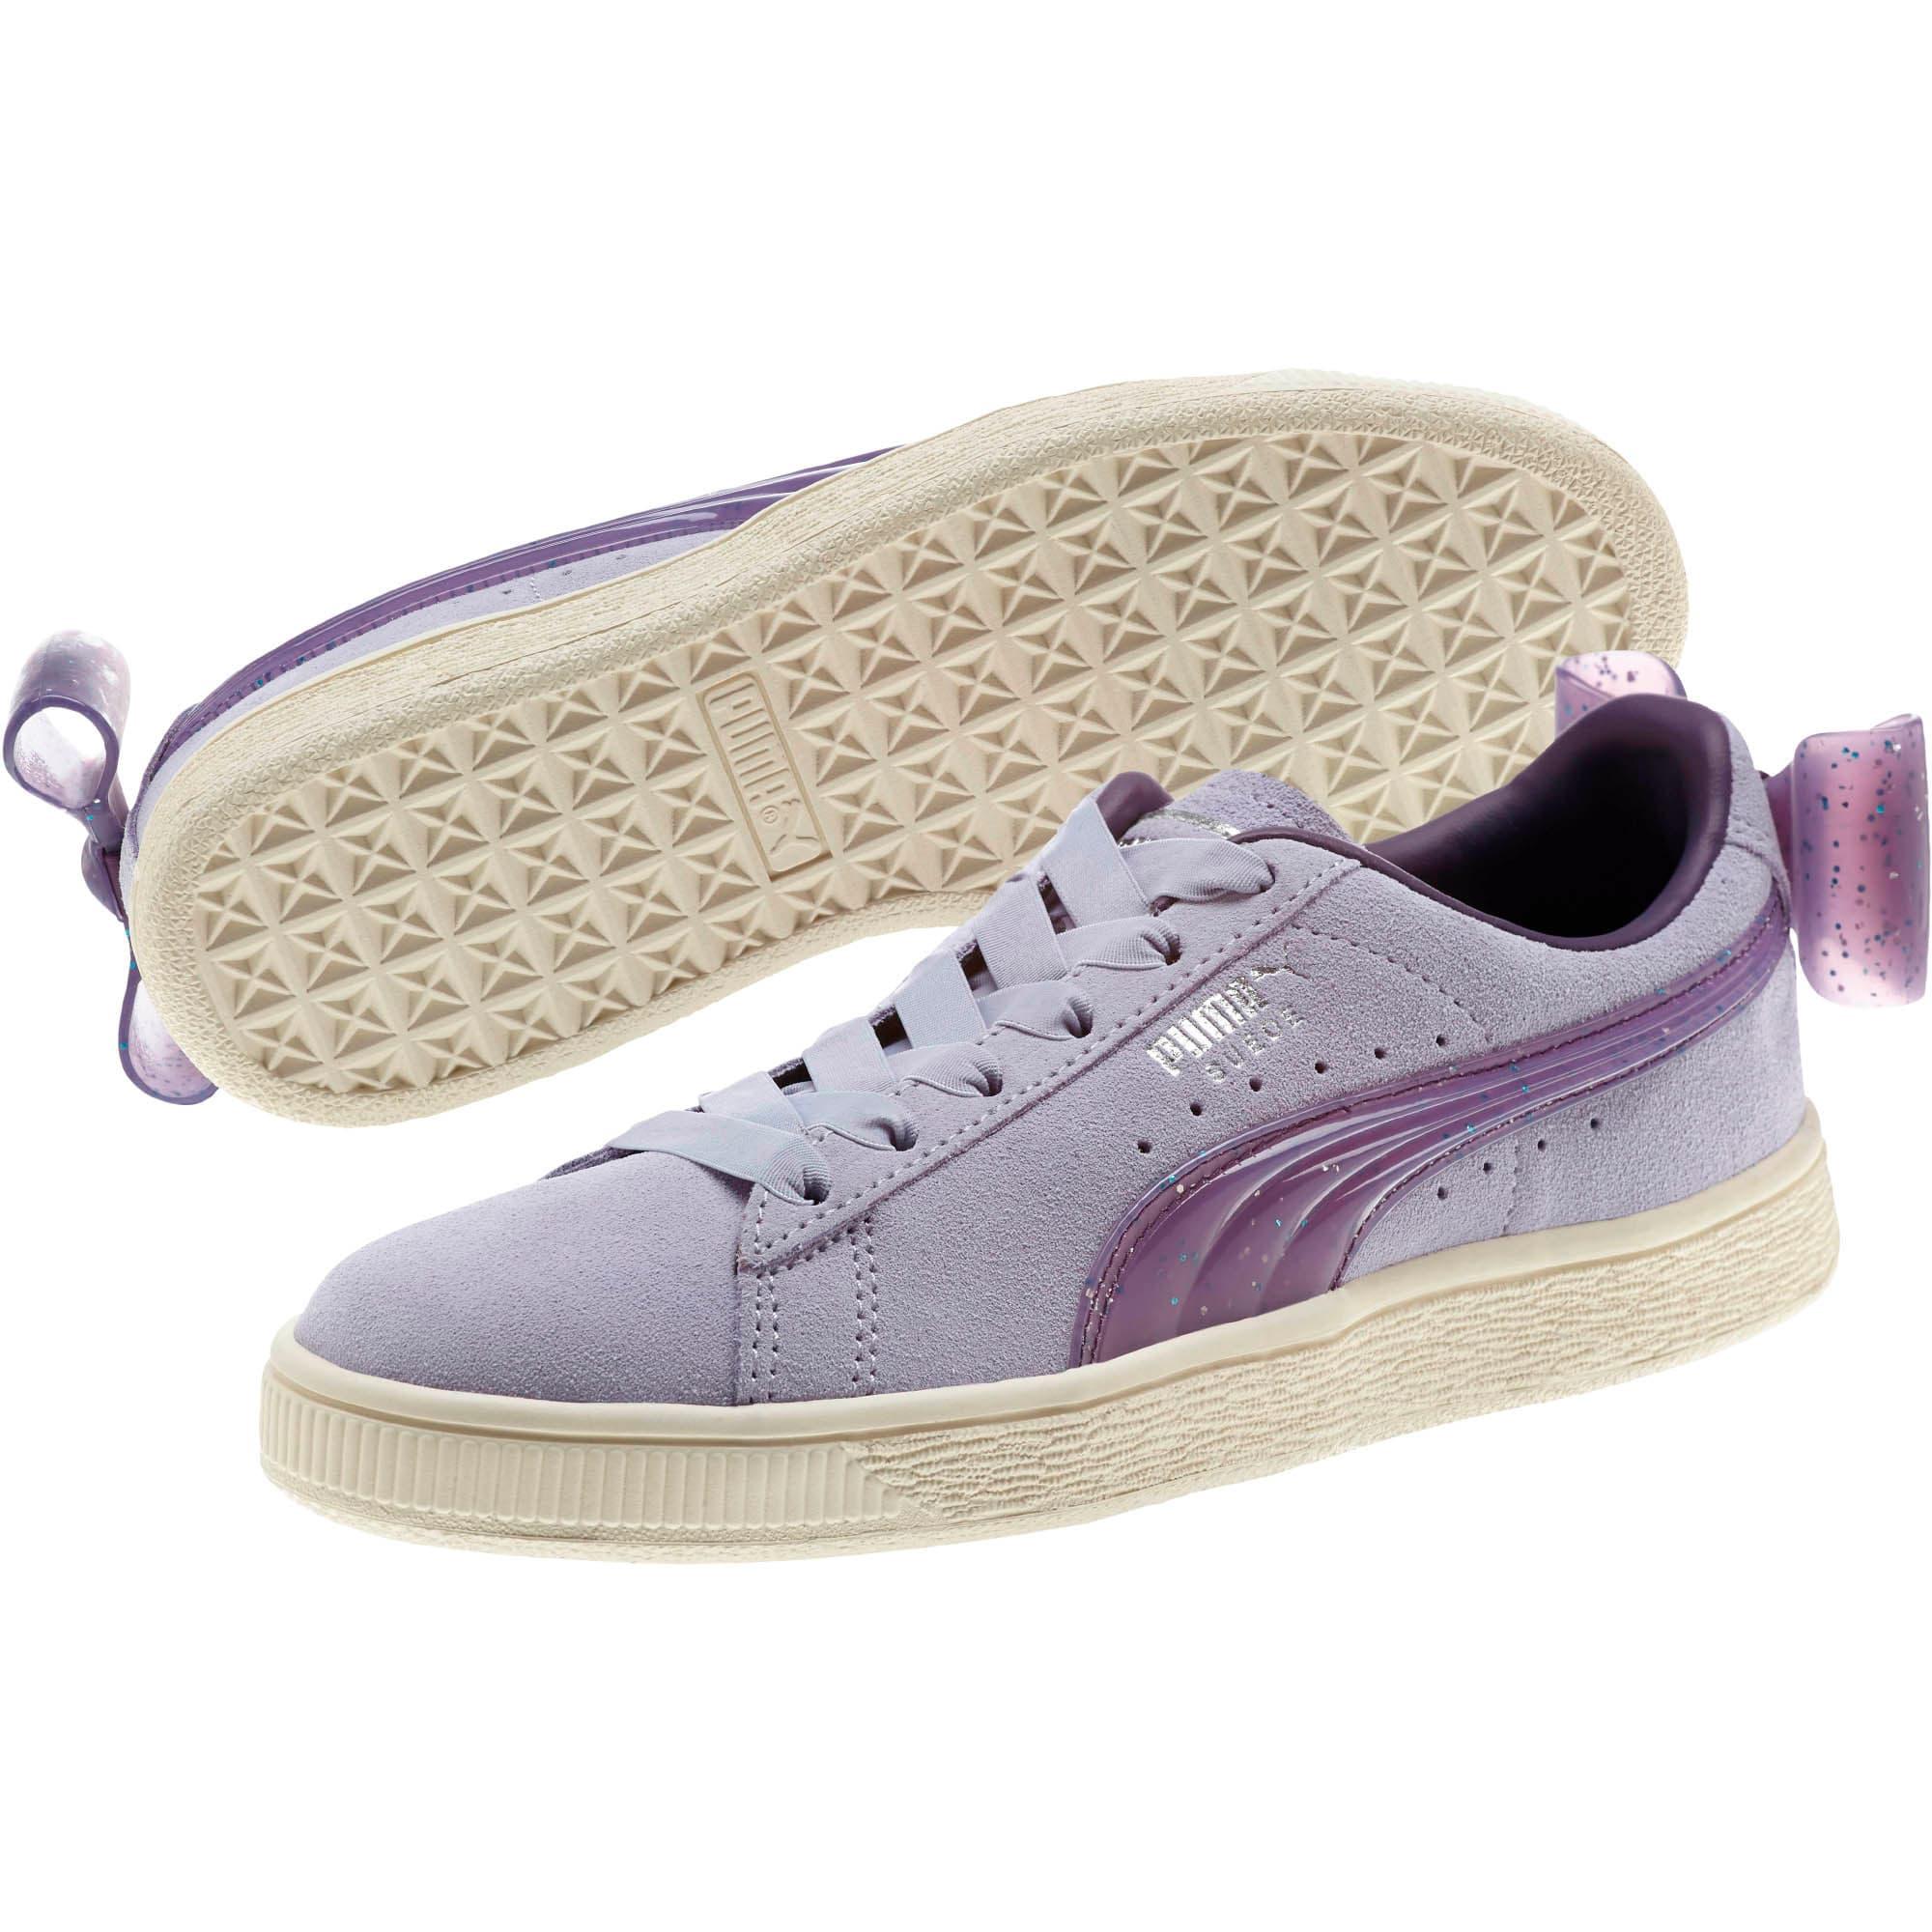 Miniatura 2 de Zapatos deportivos Suede Jelly Bow JR, SweetLavender-Indigo-White, mediano